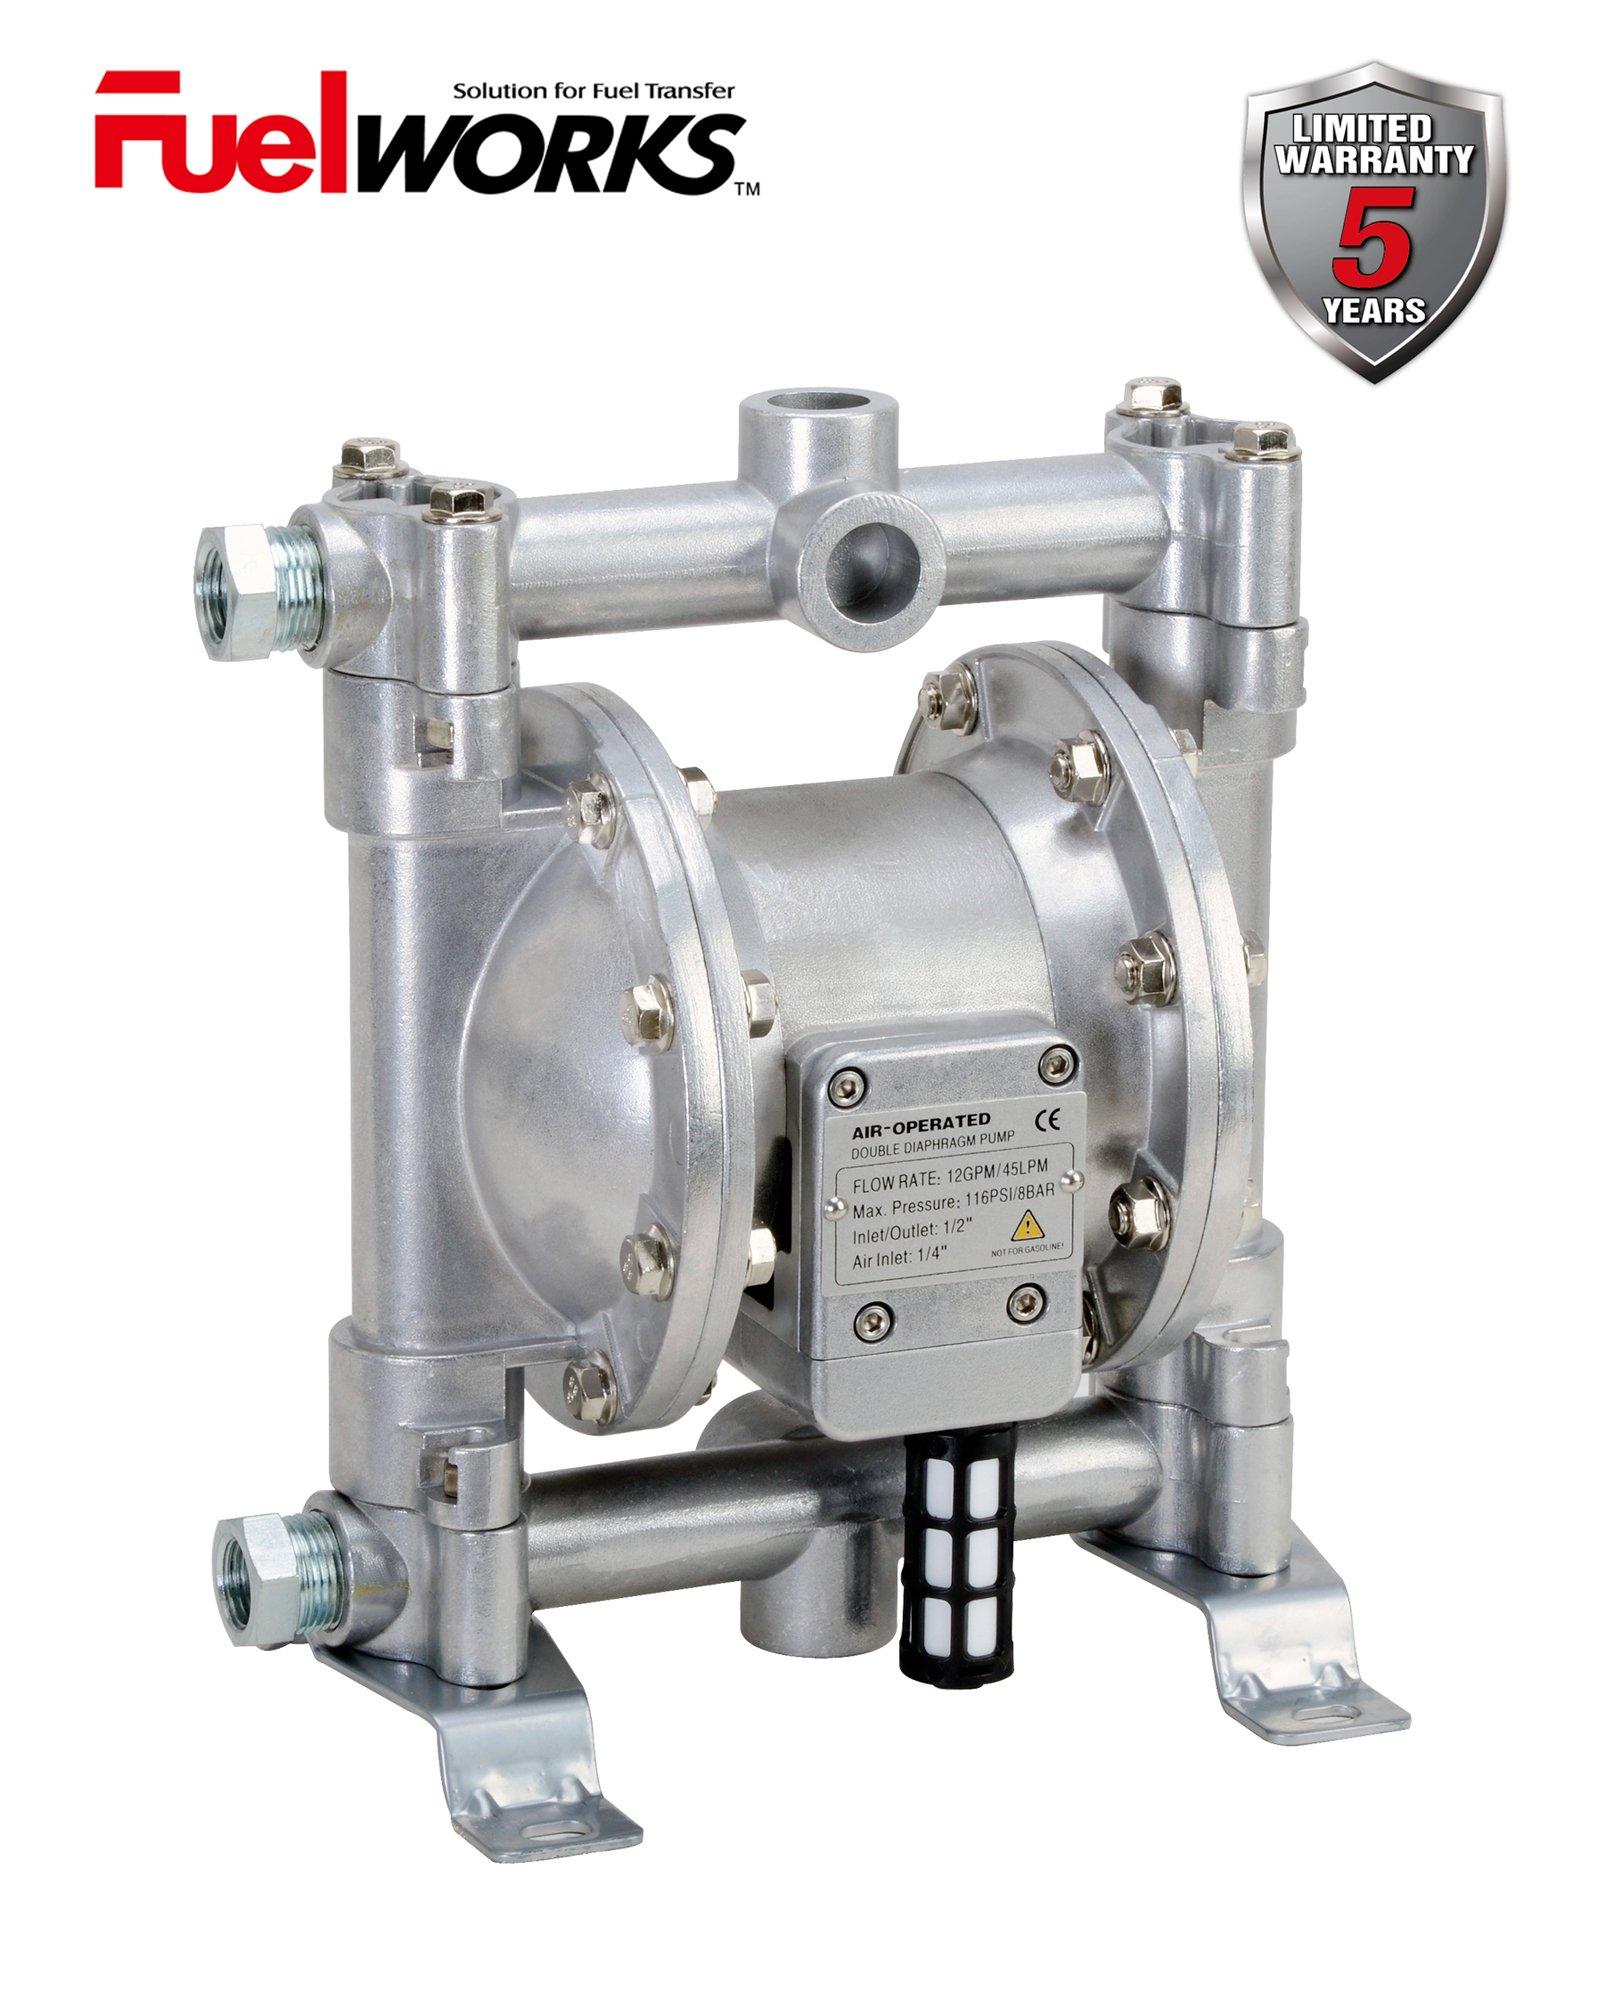 FUELWORKS Heavy Duty Air-Operated Aluminium Diaphragm Pump (Nitril- 12GPM 1/2'')